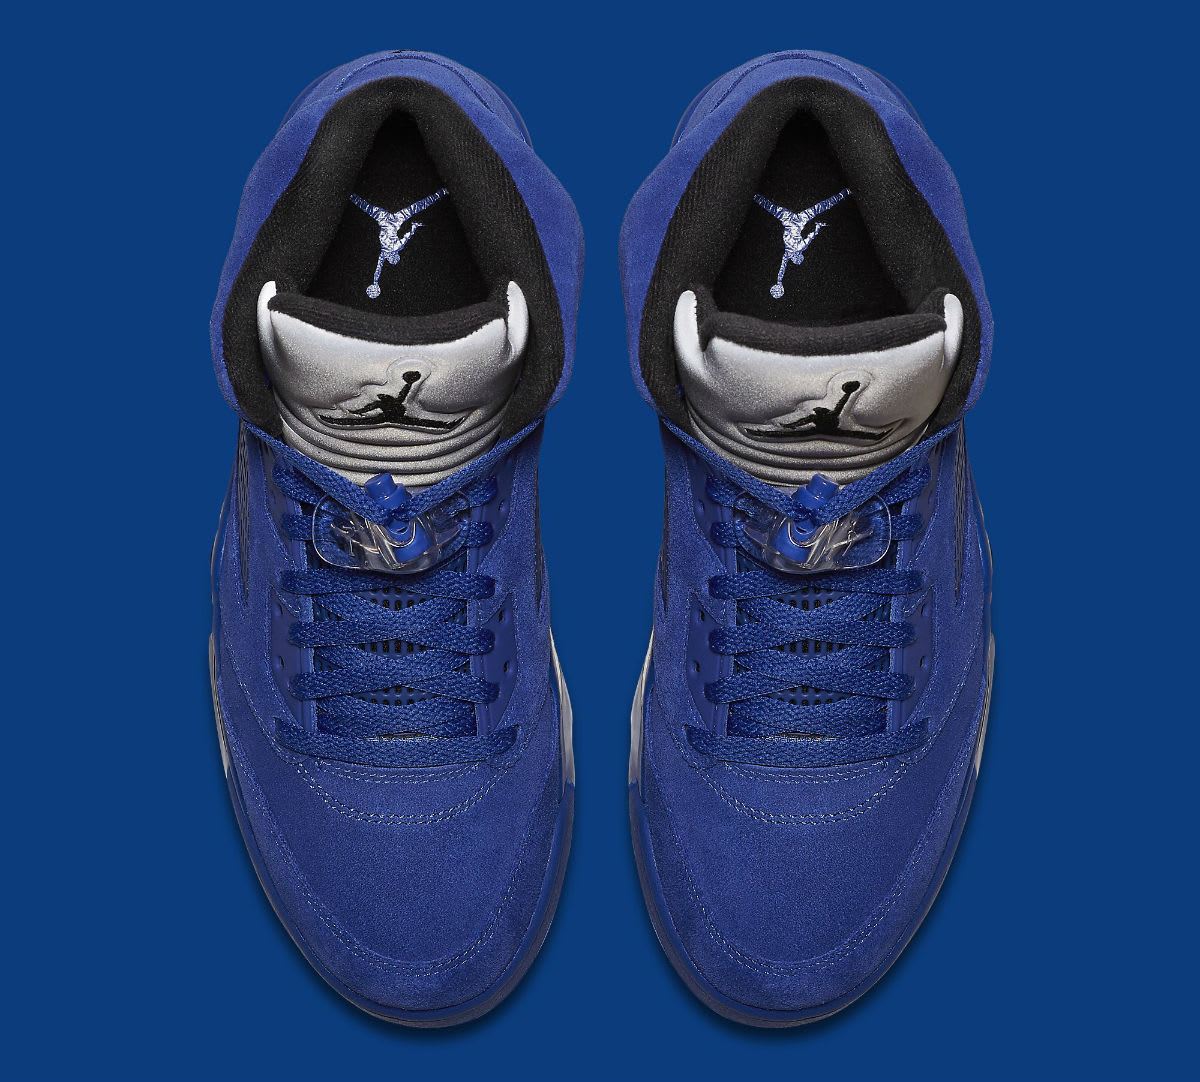 Air Jordan 5 Royal Blue Suede Flight Suit Release Date Top 136027-401